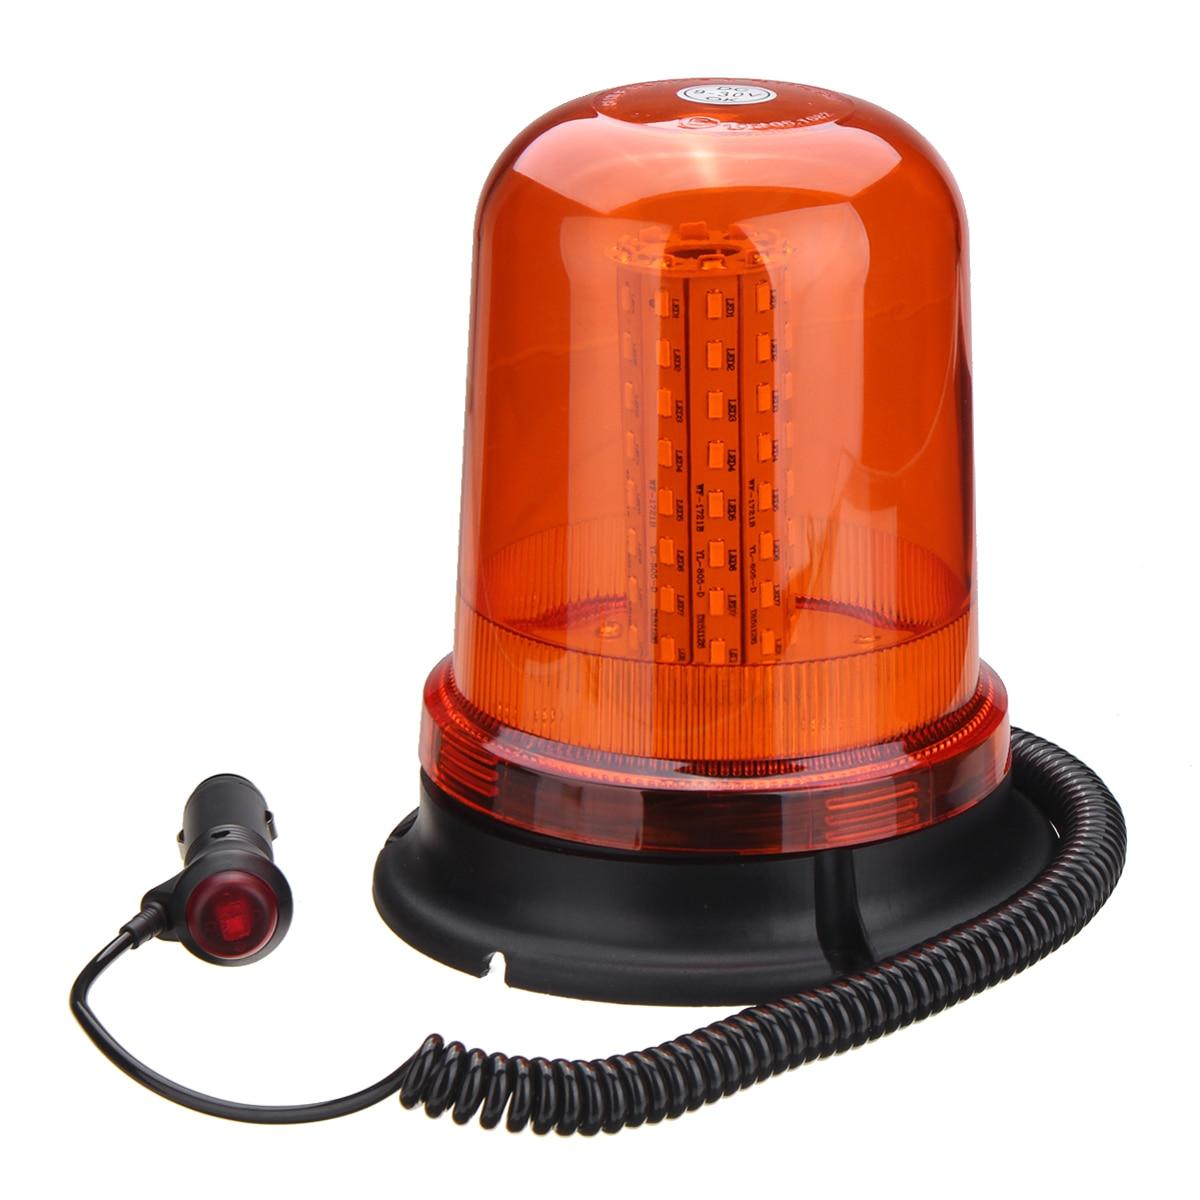 80 LED Magnetic Mount Rotating Flashing Amber Dome Beacon Recovery Warning Light Roadway Safety 10 led led beacon magnetic bolt recovery flashing warning strobe light lightbar amber